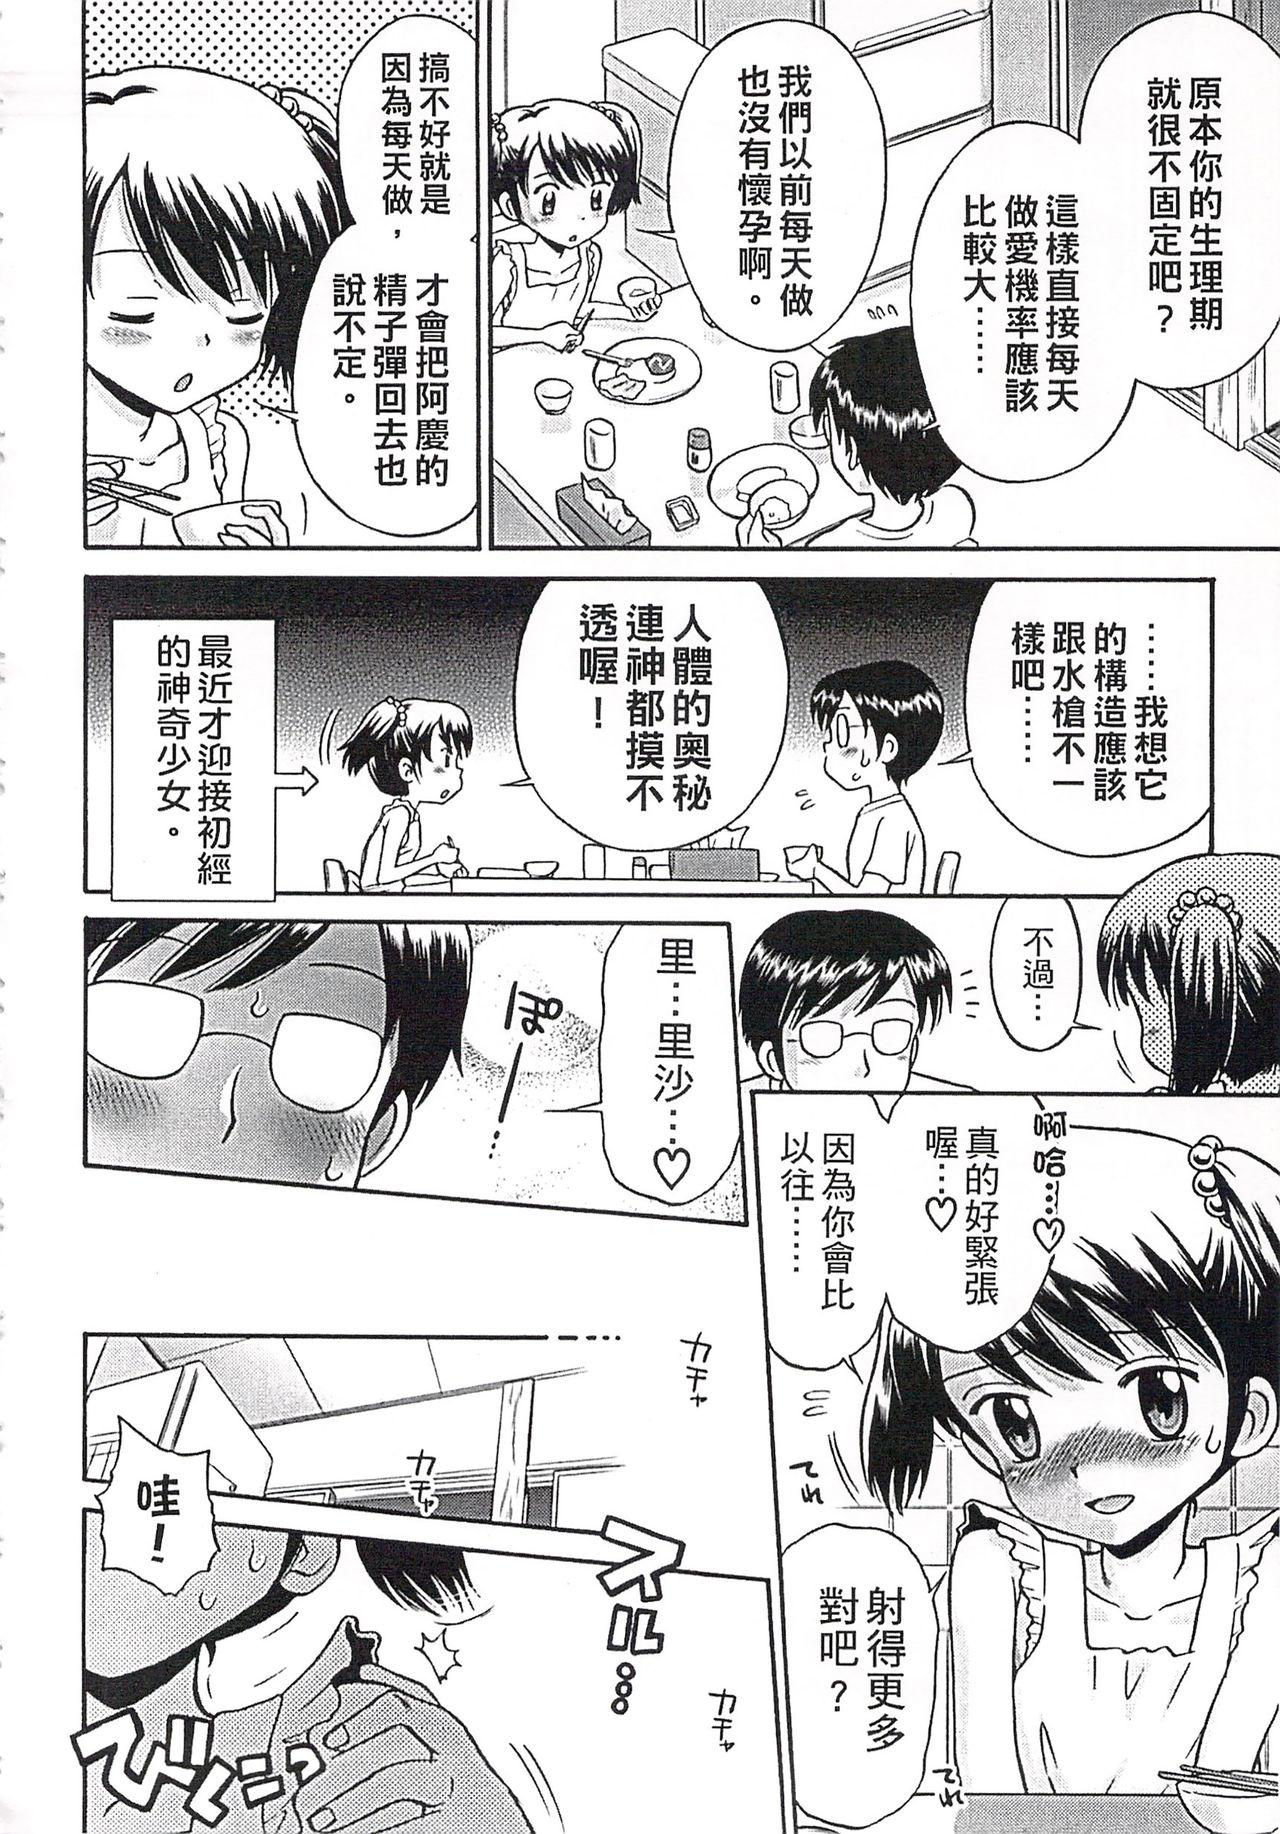 Kore demo Otona Desu Kedo!? Mrs.LOLITA Kanzenban   人家是大人啦! ~Mrs.LOLITA完全版 119